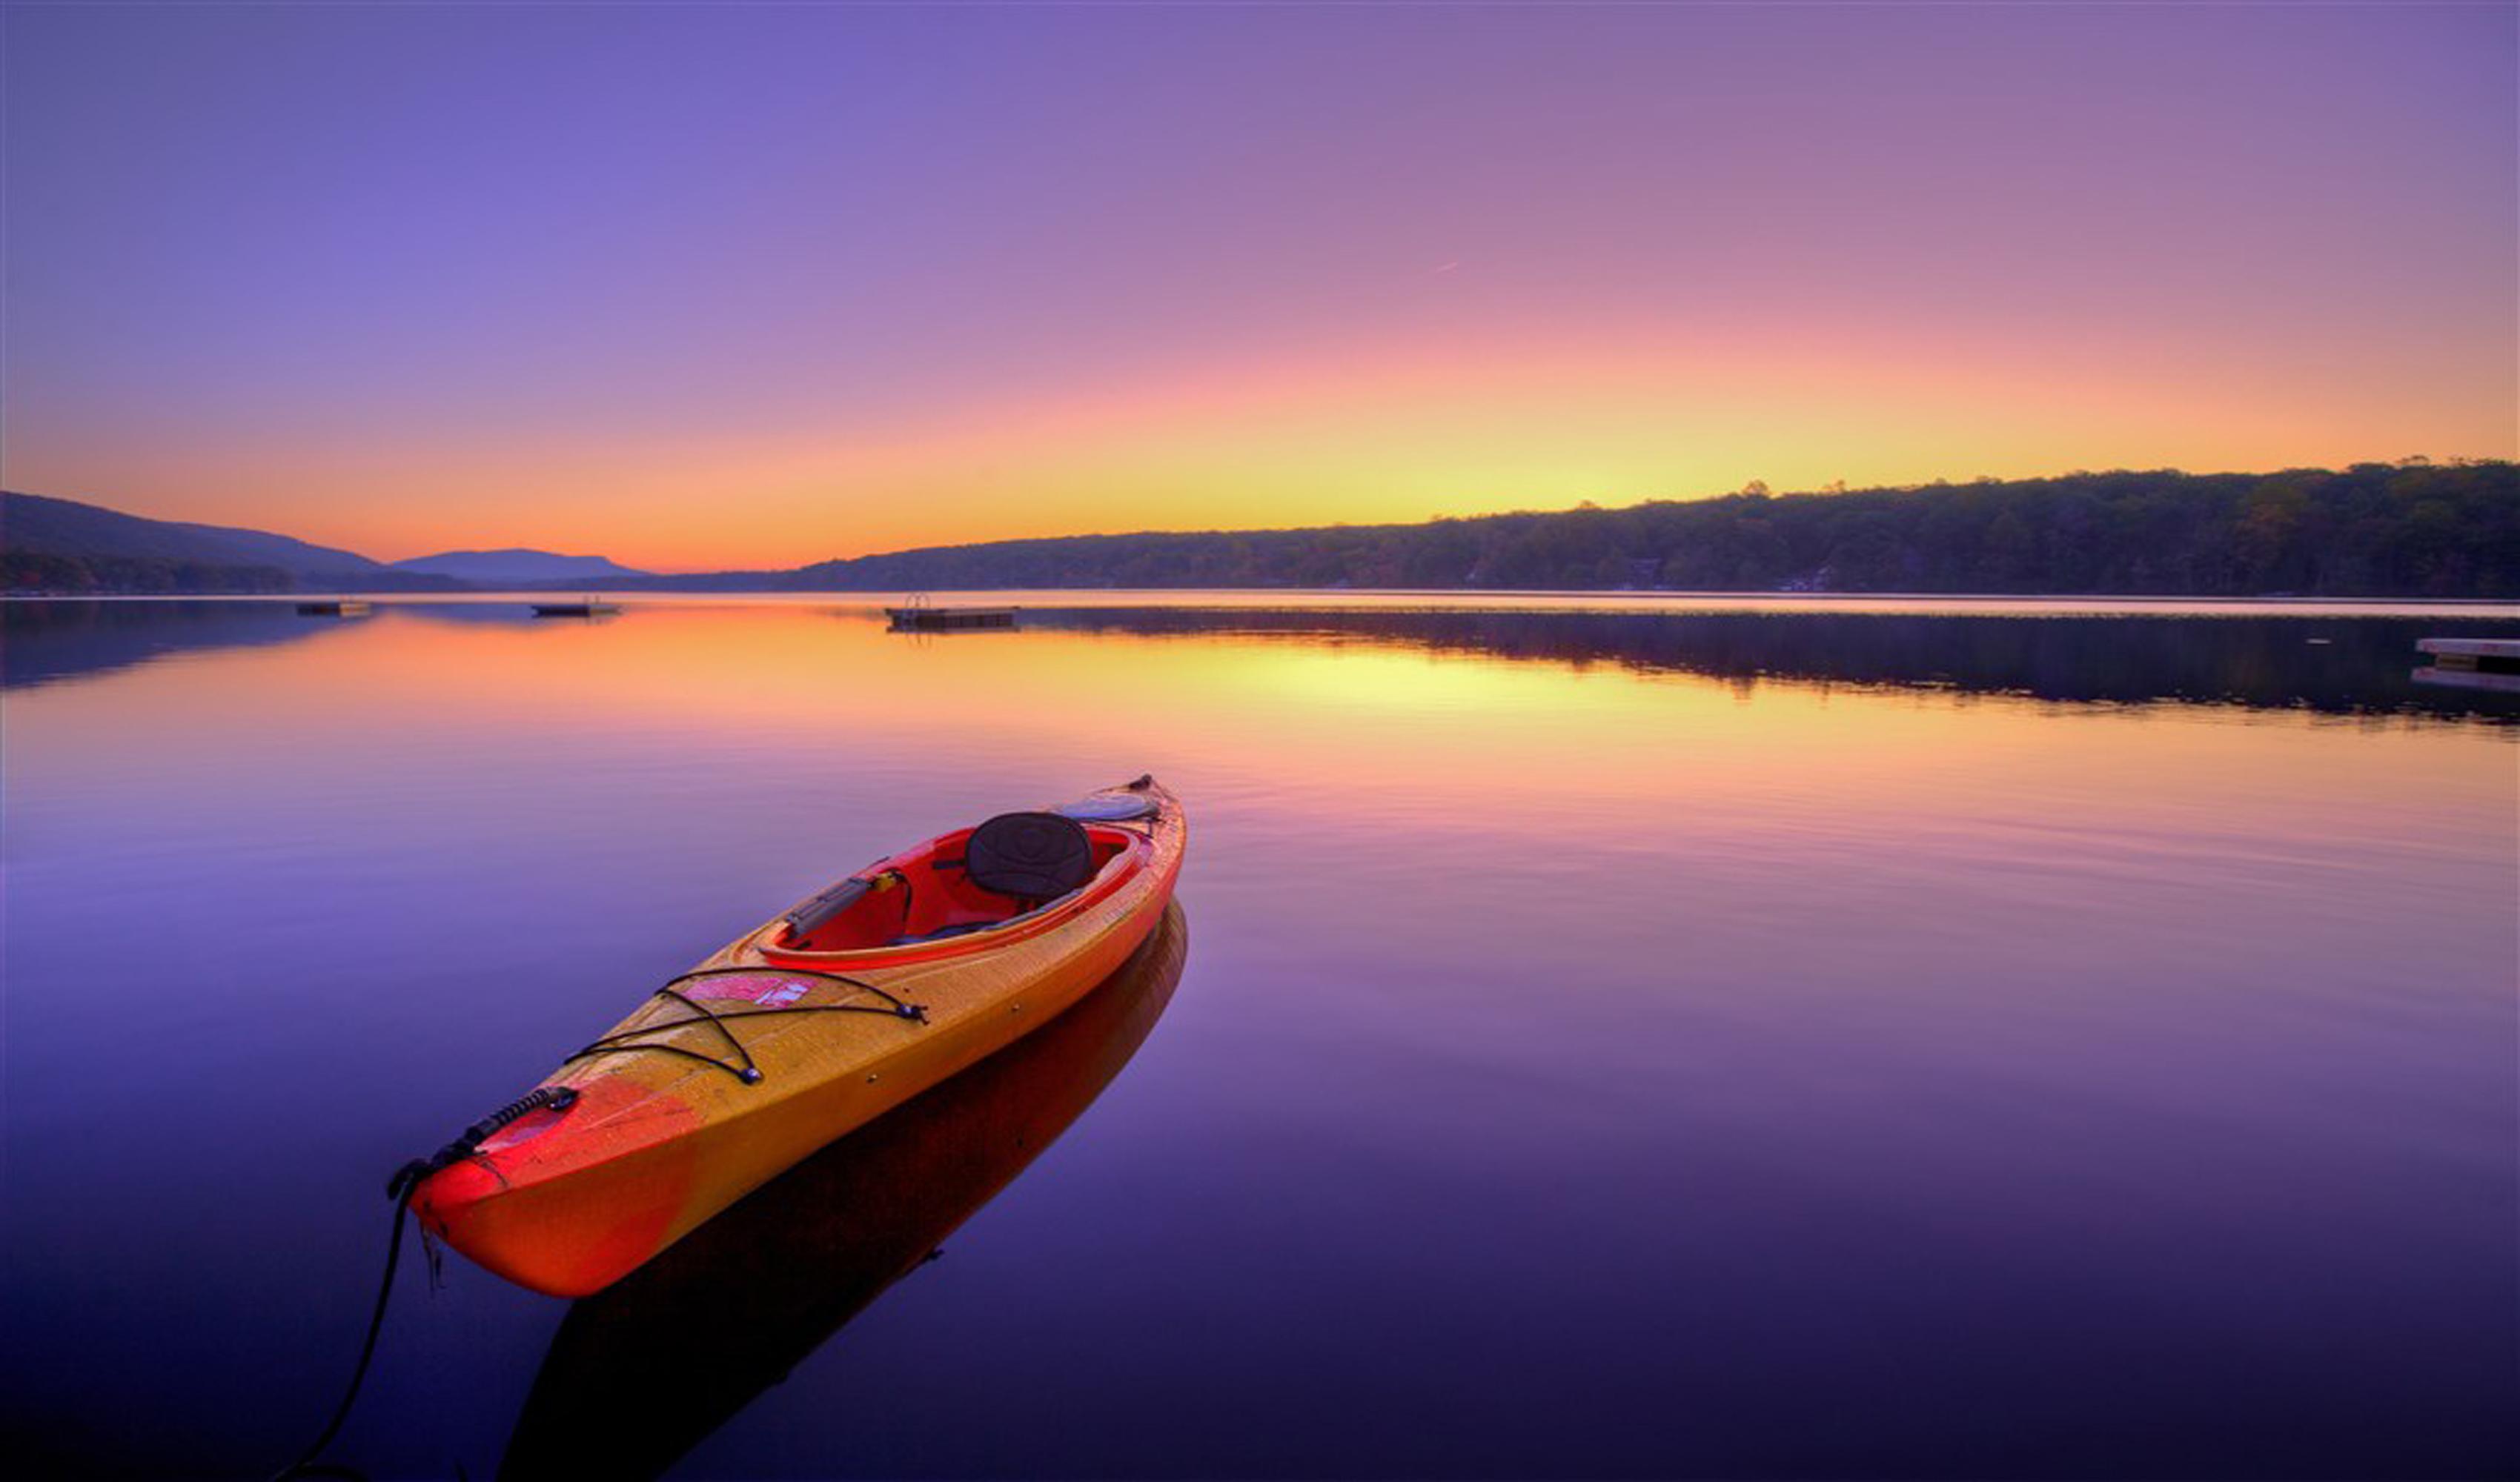 Kayak Canoe Boat Small Boat Background Water Sea Sky